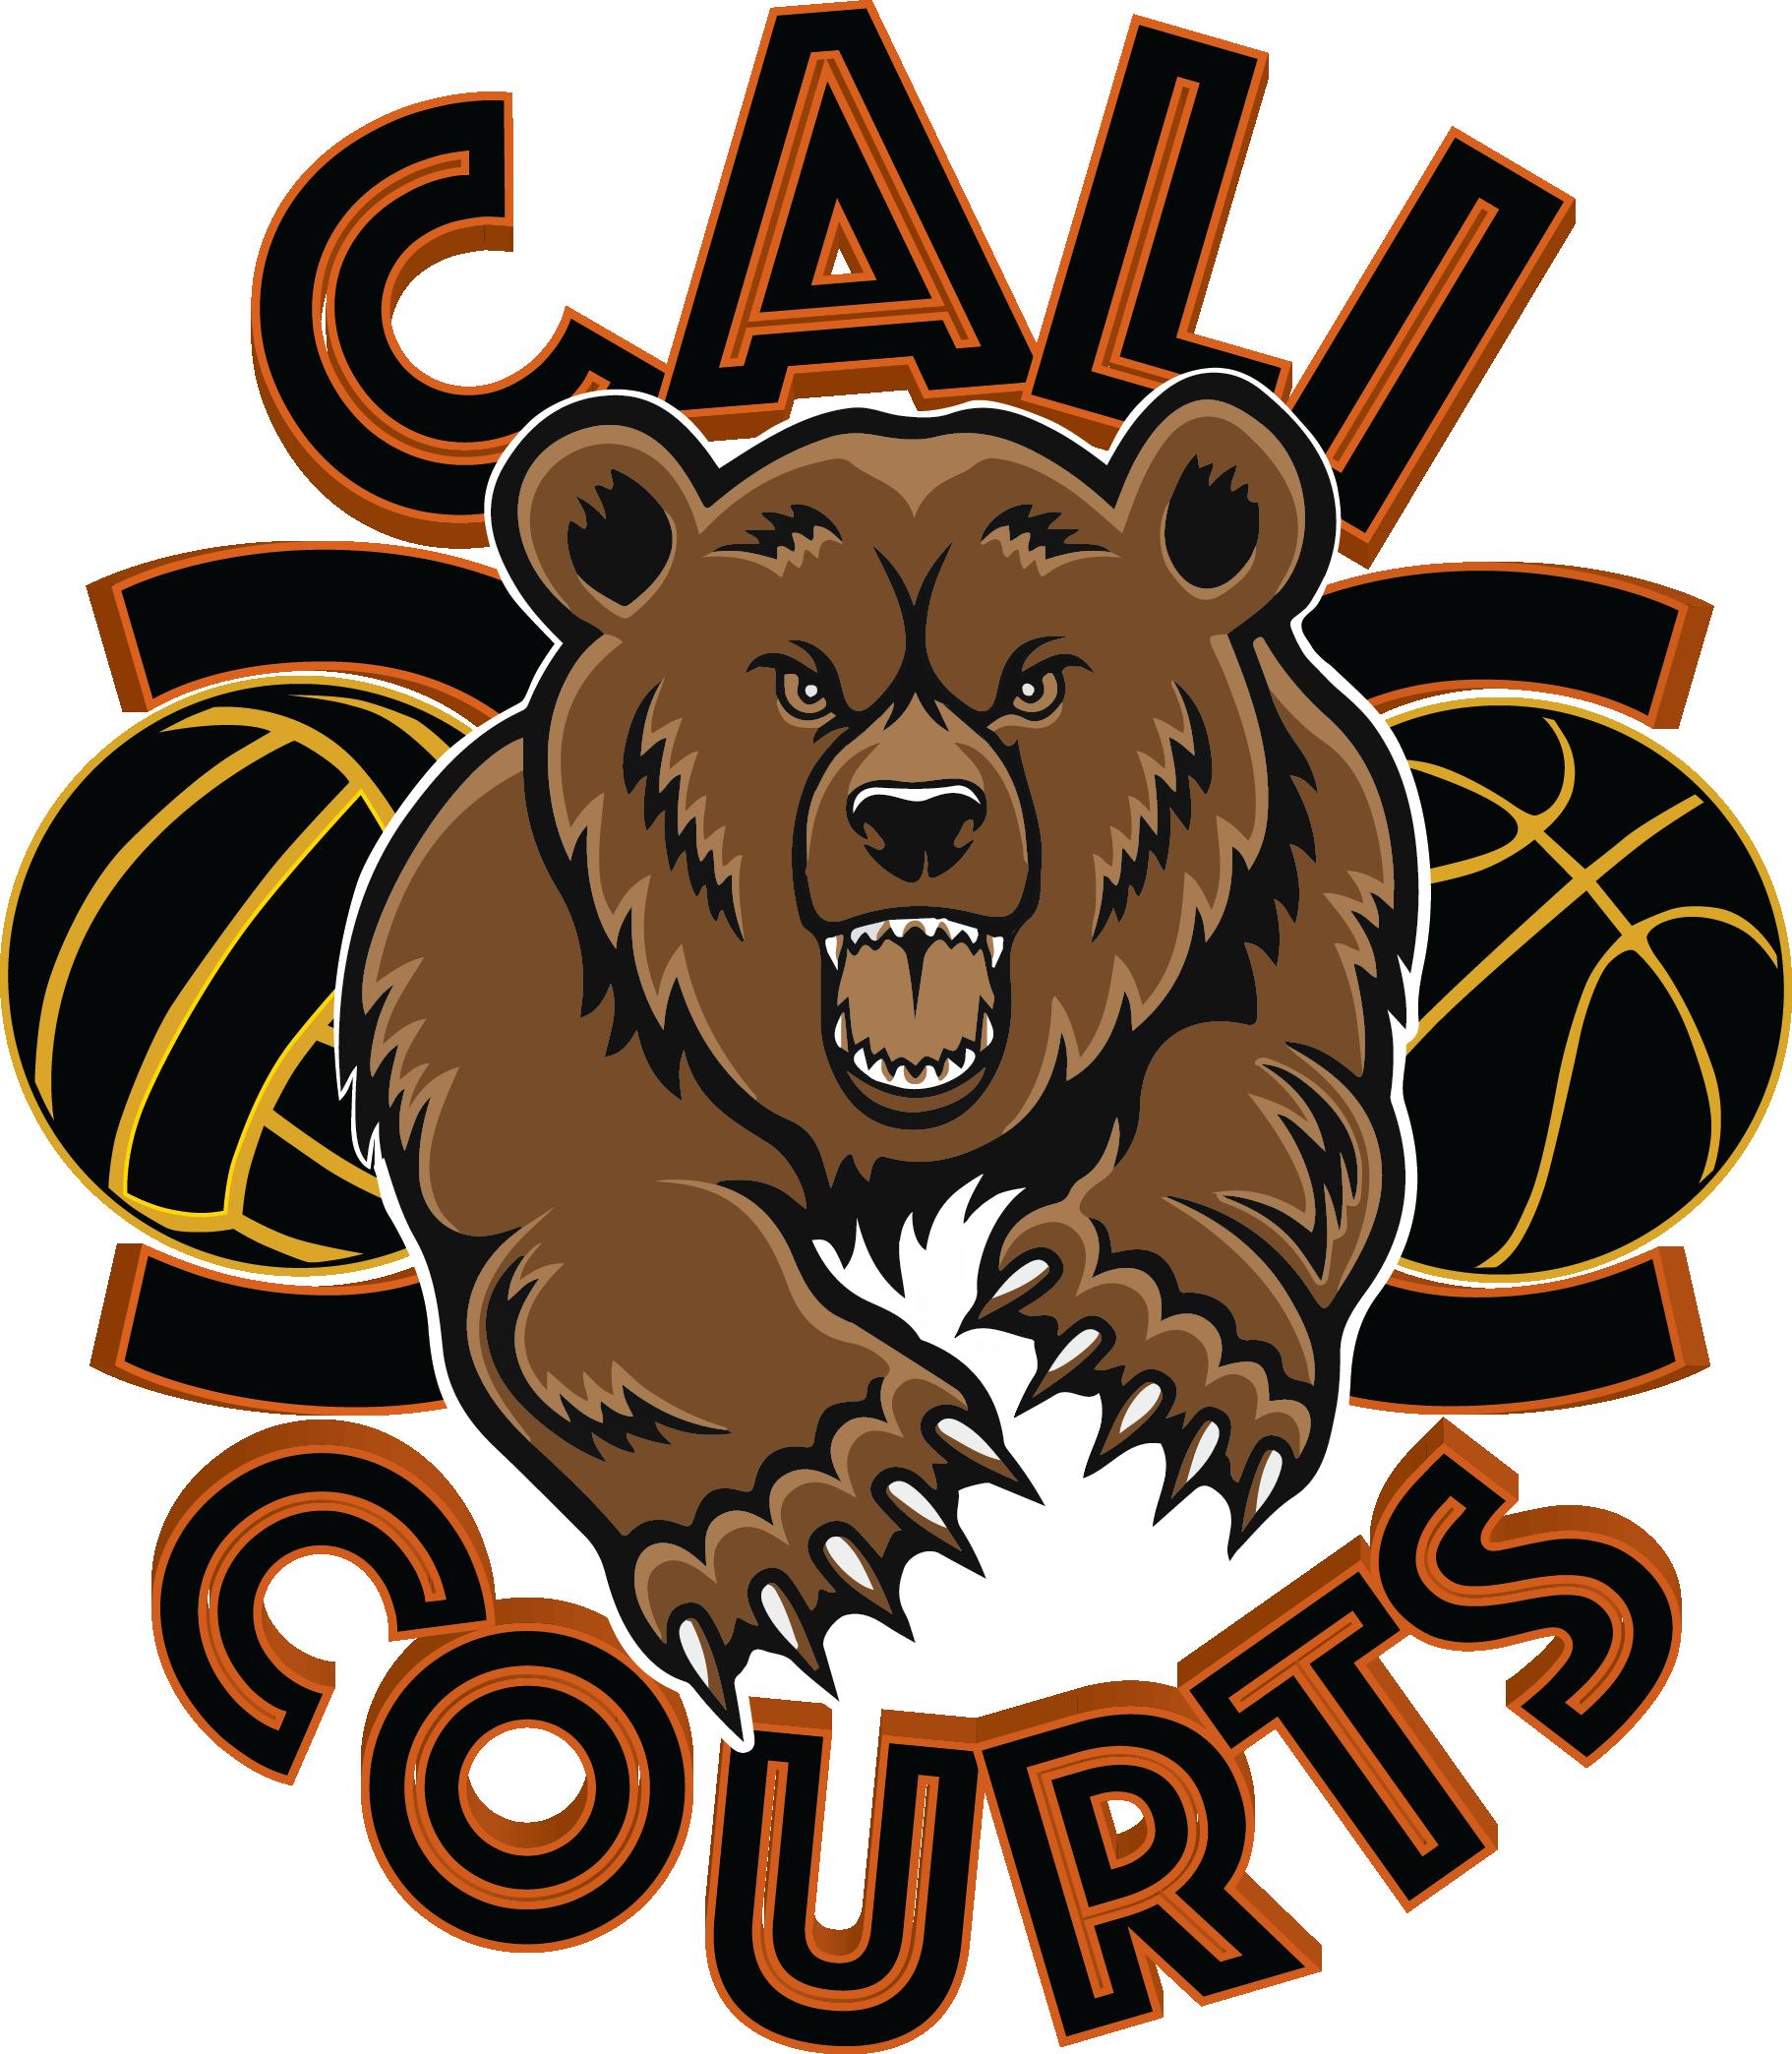 Cali Courts